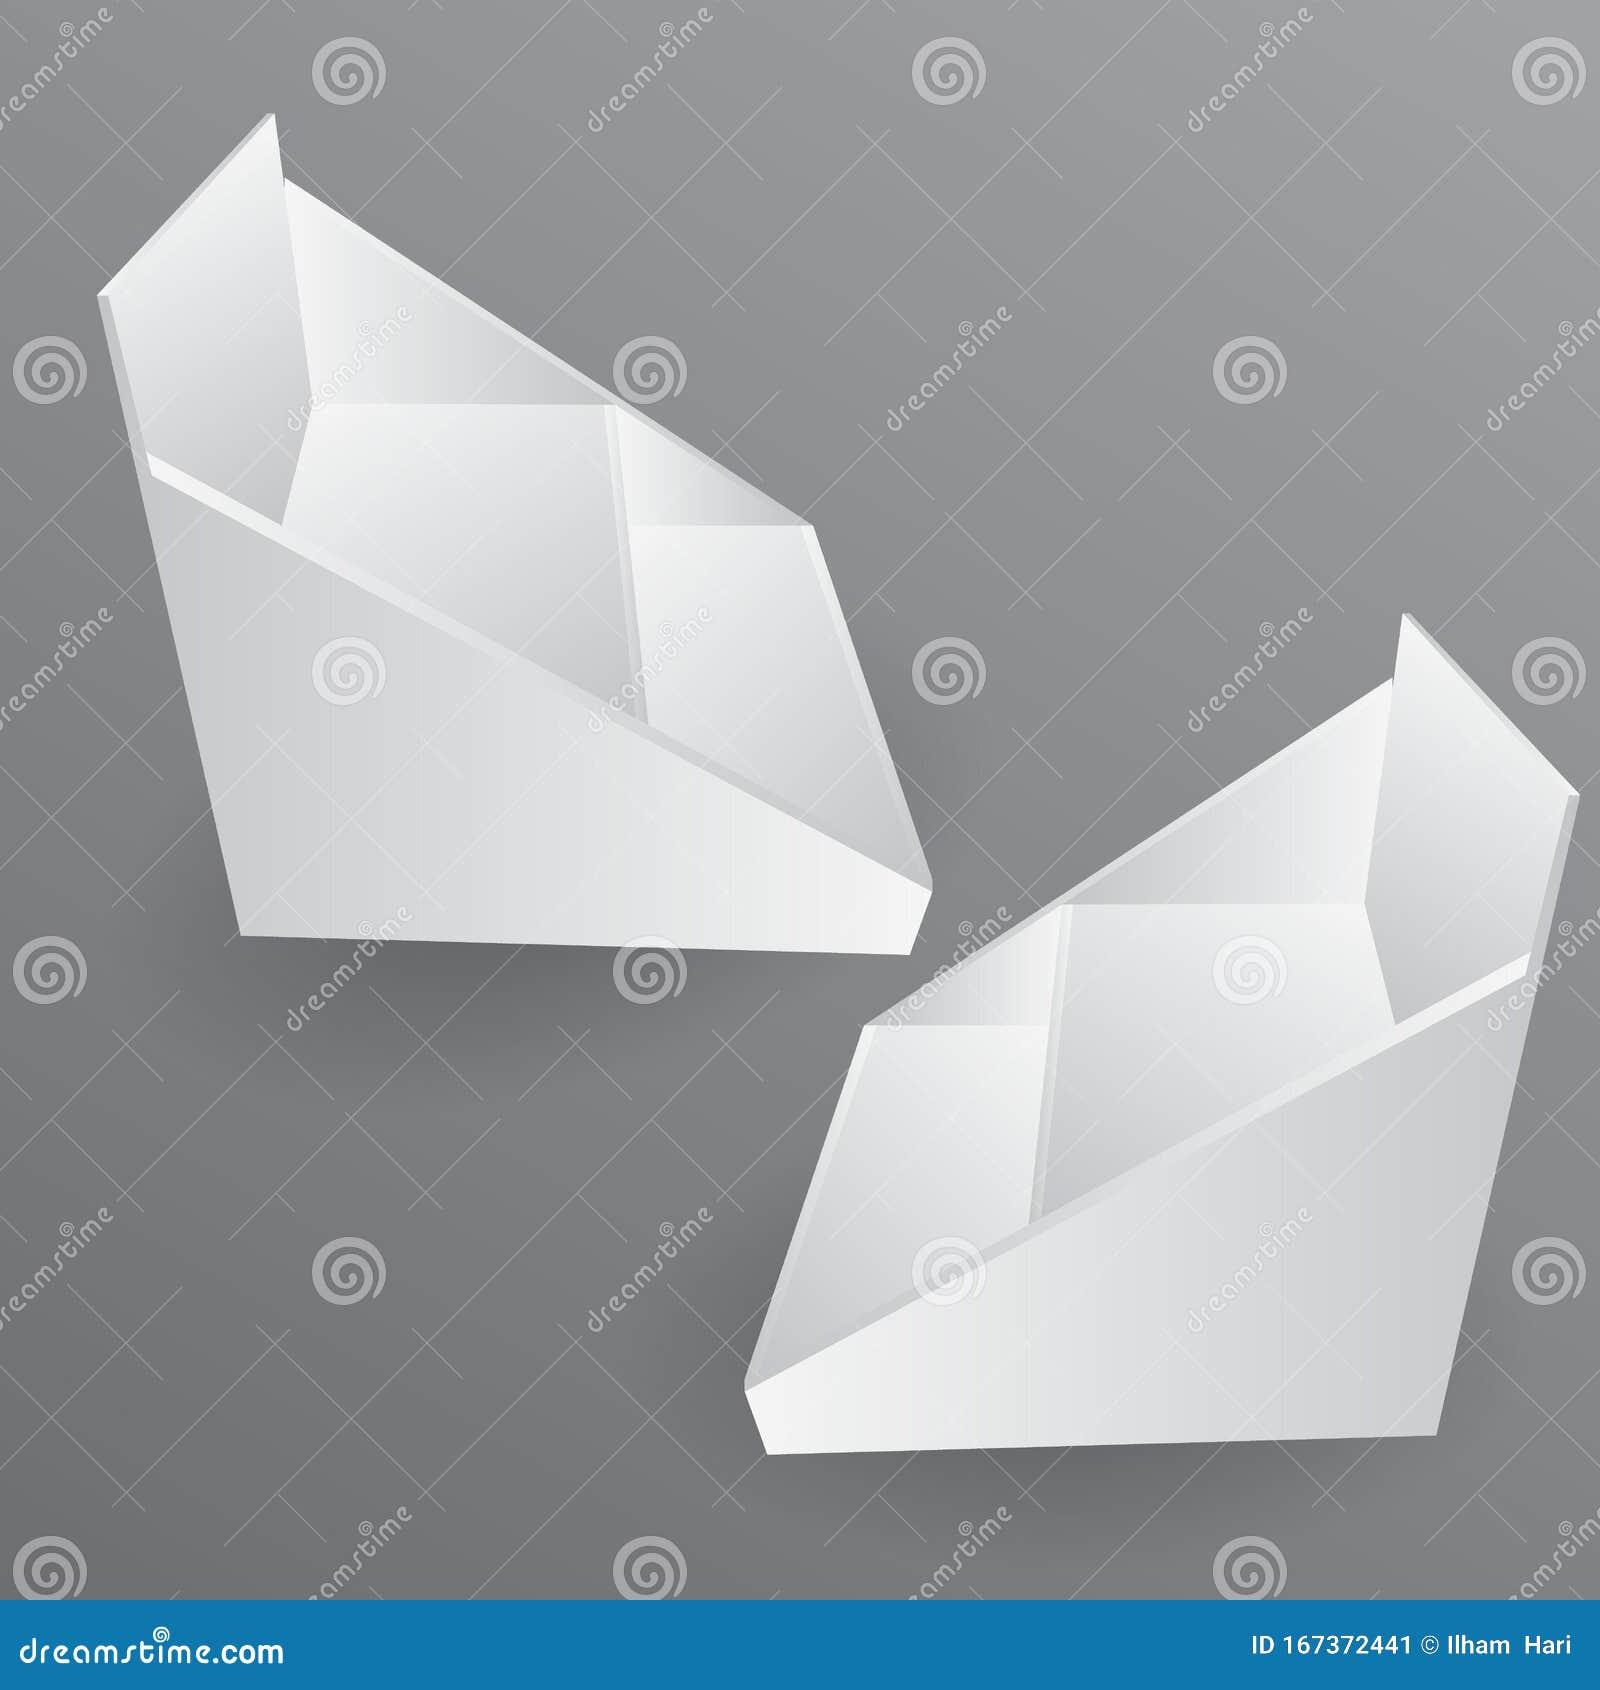 Origami Photo Display Stand Tutorial - Paper Kawaii - YouTube | 1689x1600